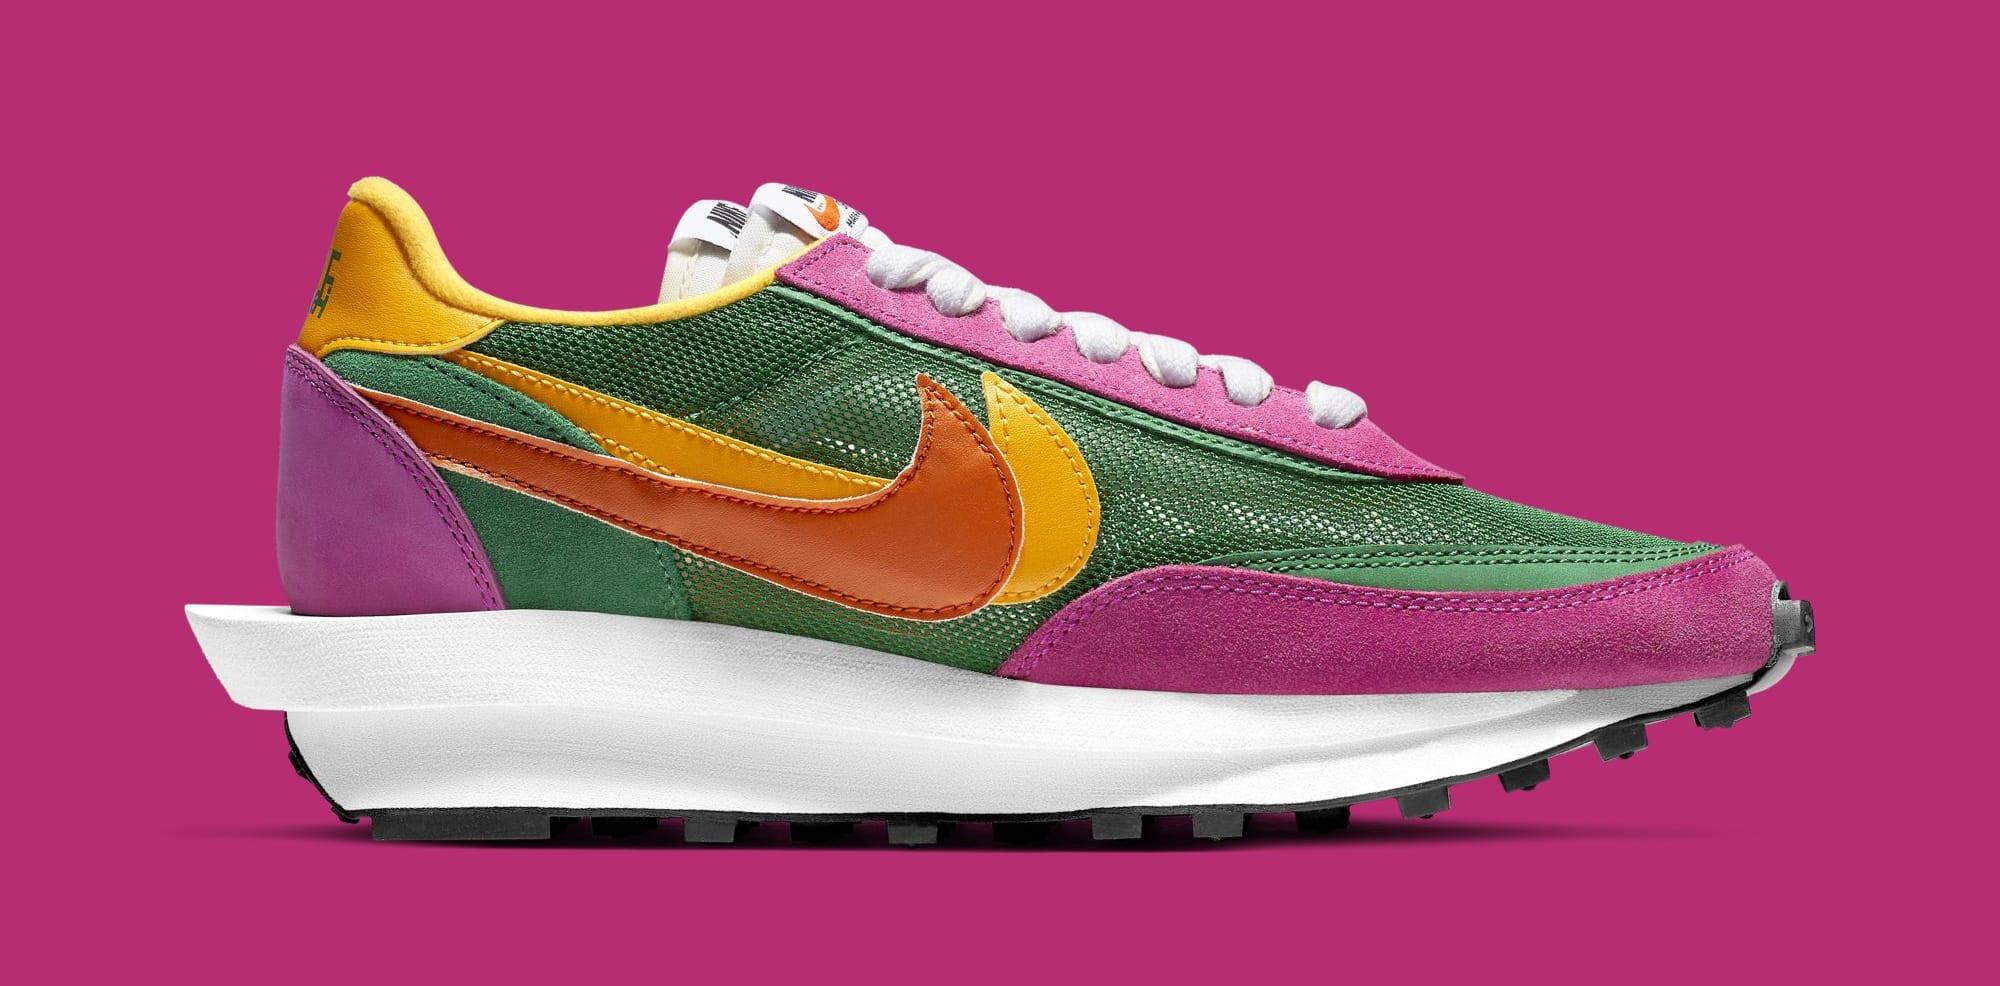 Sacai x Nike LDWaffle BV0073-301 (Medial)